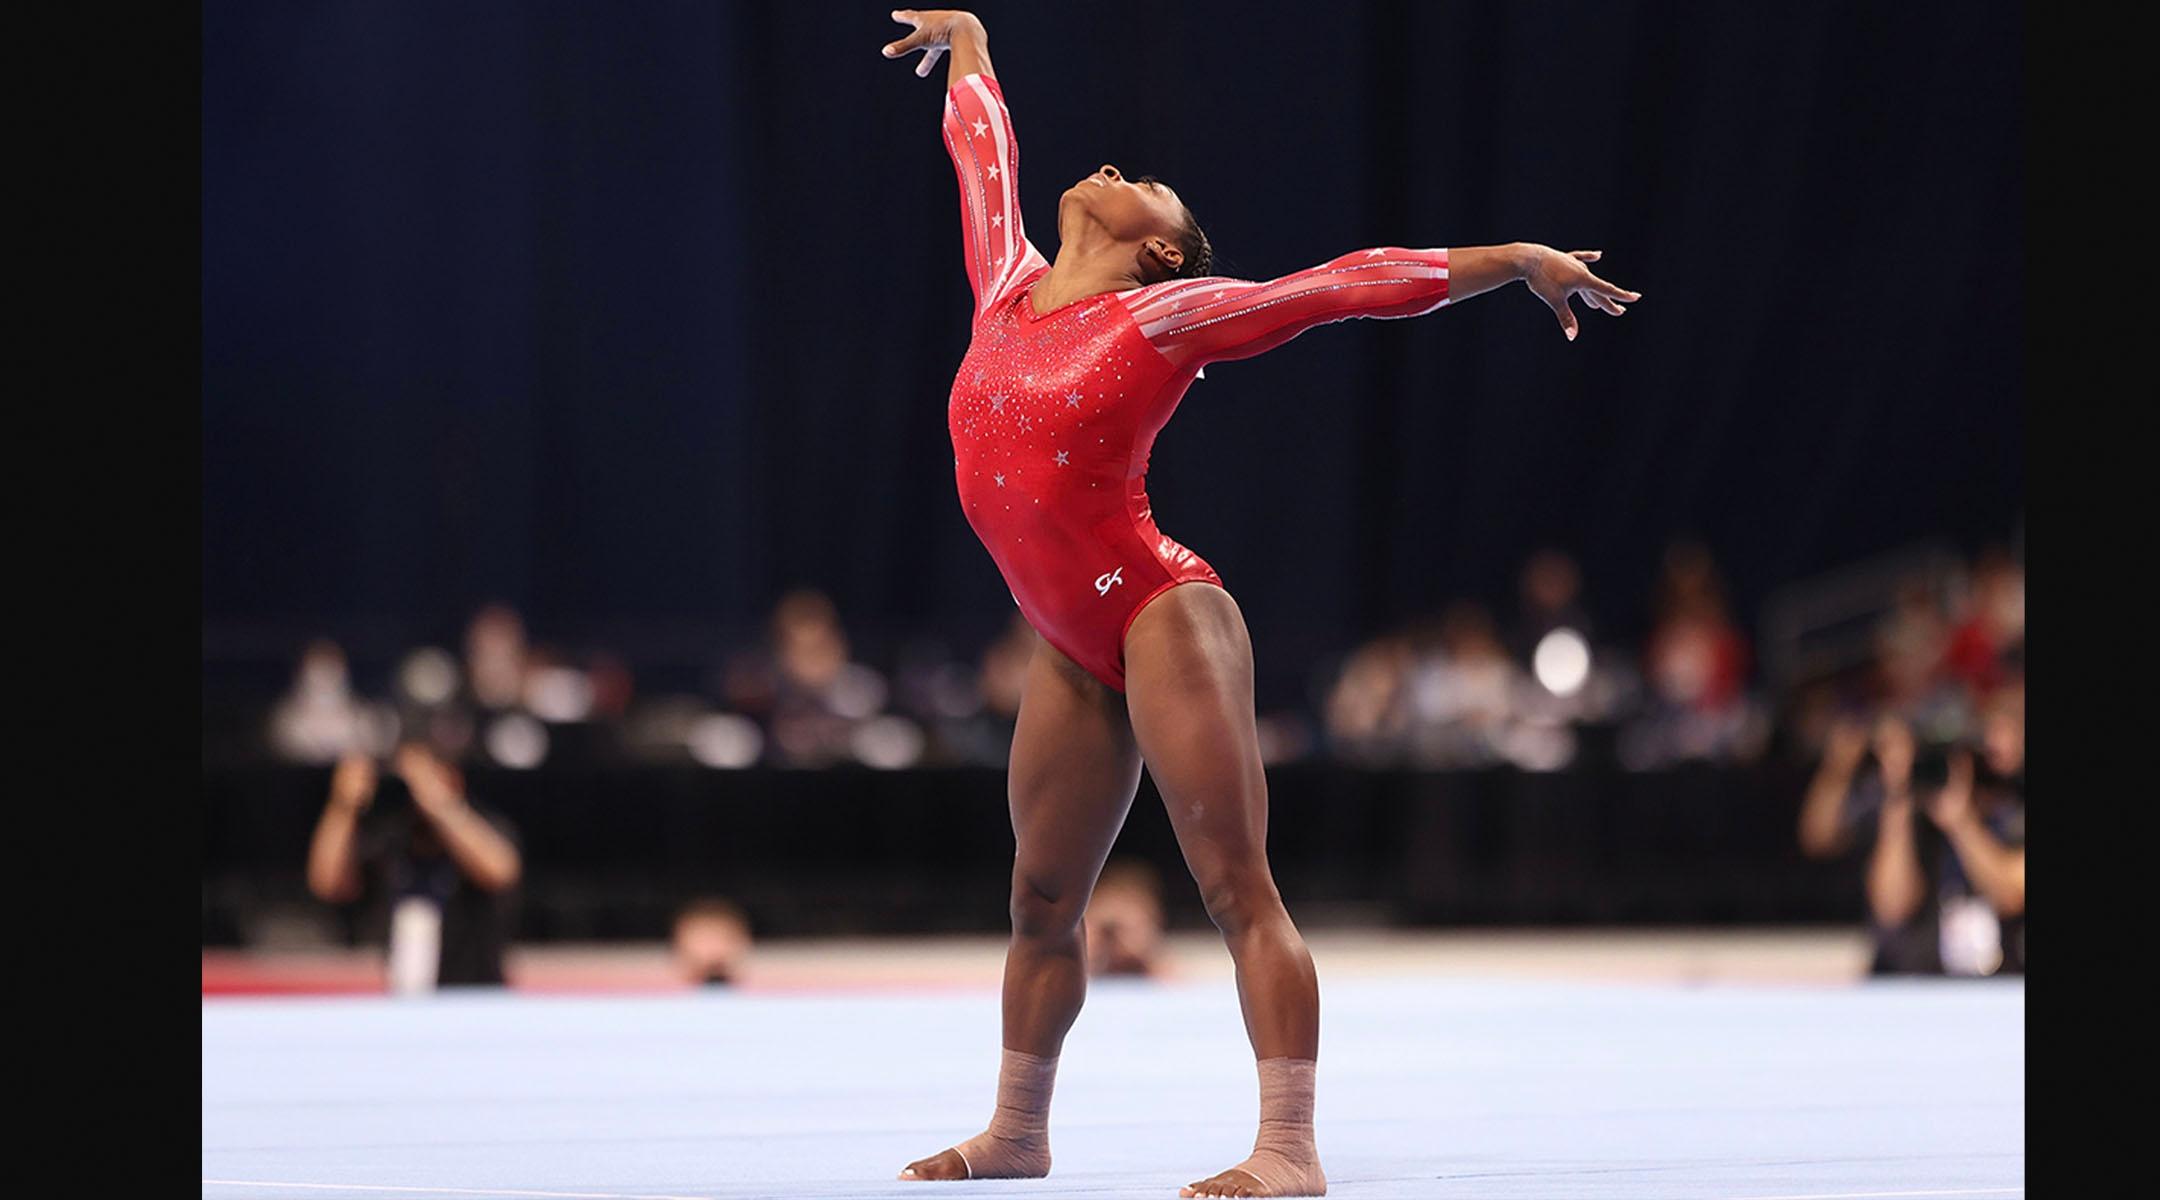 Meet the Jewish dancer choreographing Simone Biles' Olympic floor routine